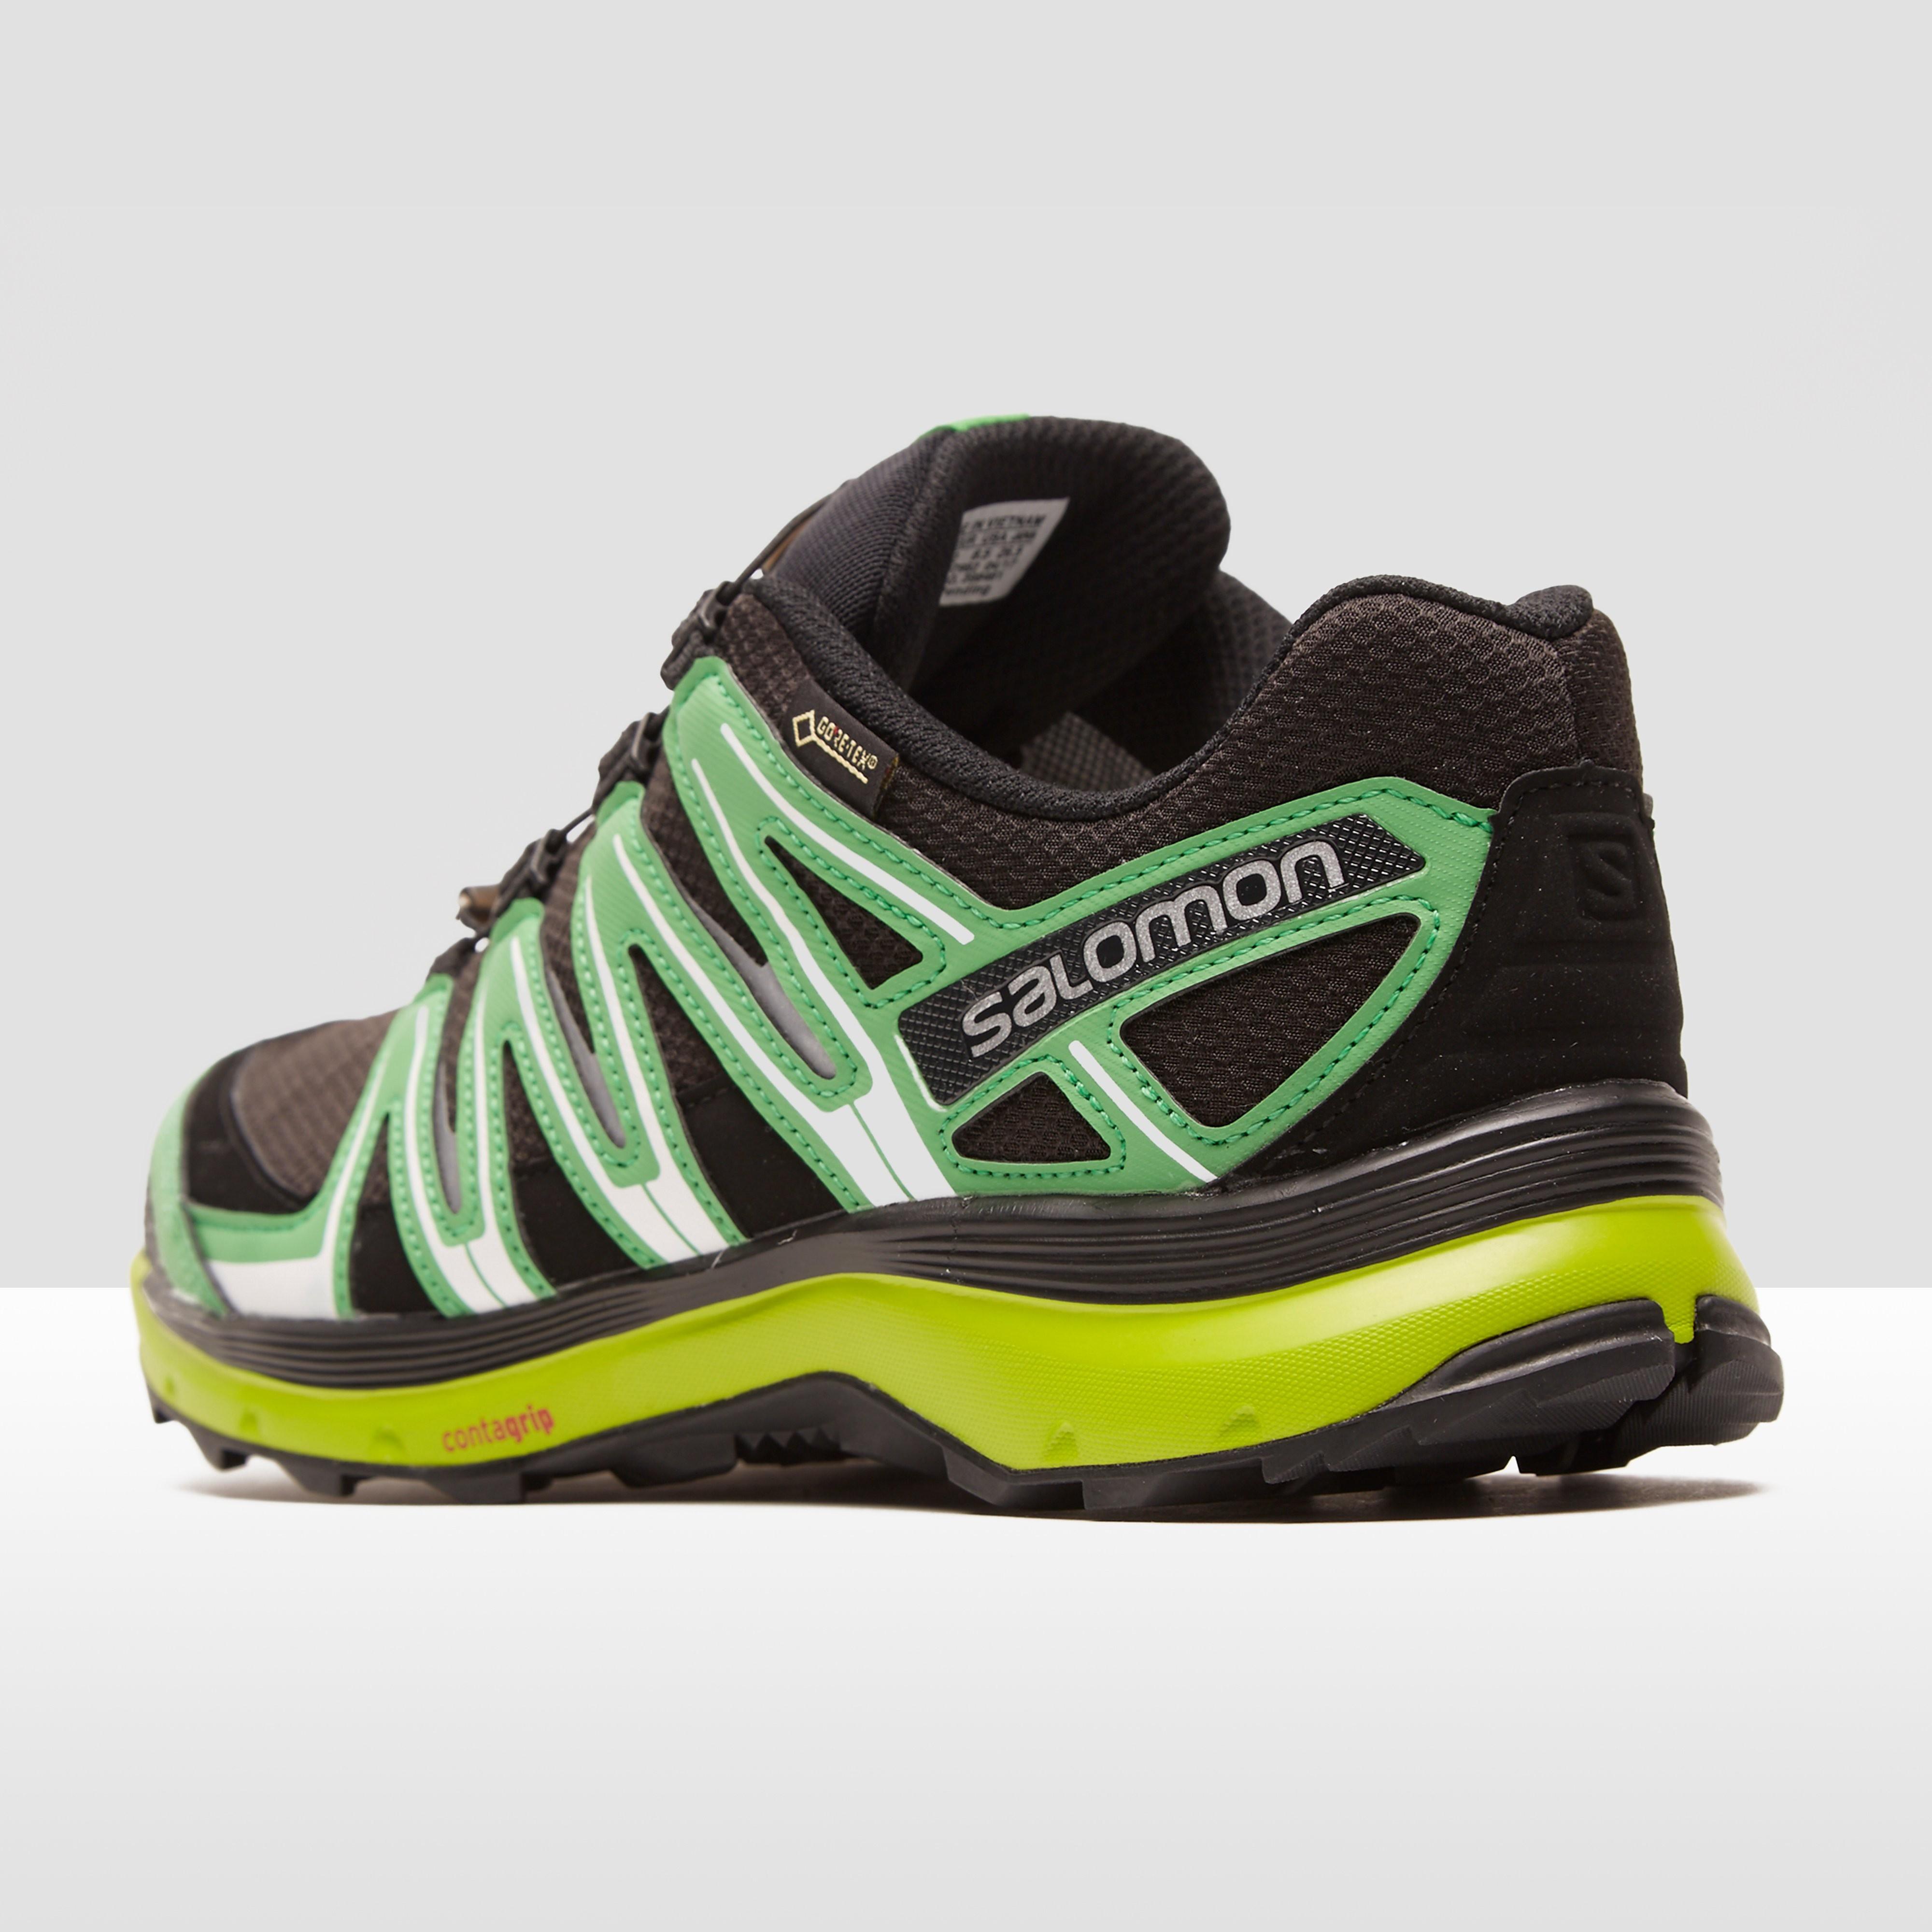 Salomon XA Lite GTX Men's Trail Running Shoes